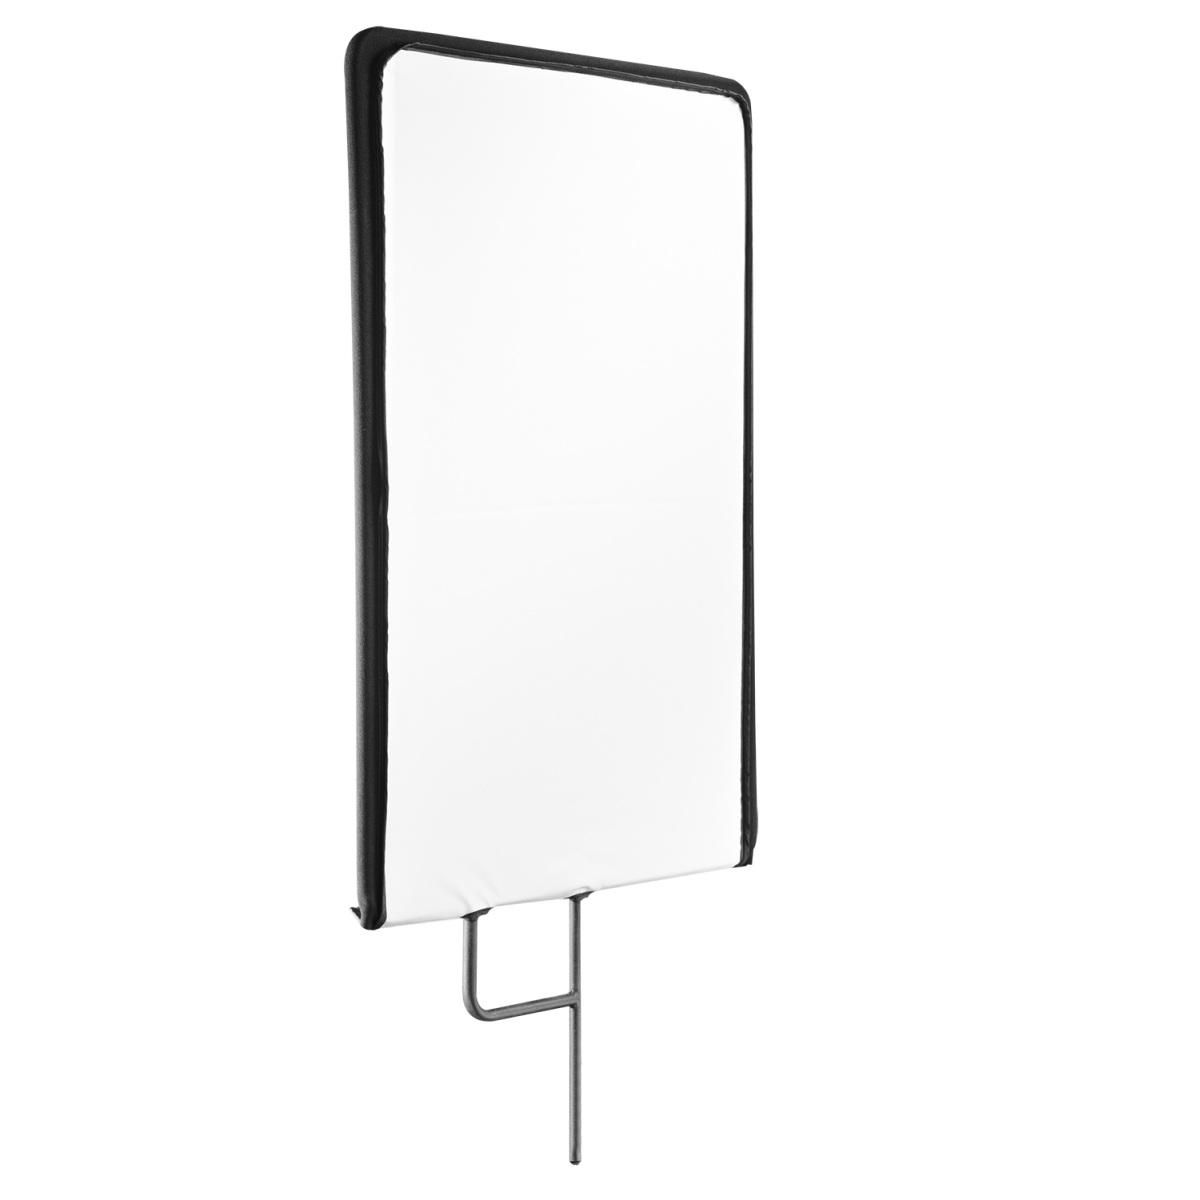 Walimex 4in1 Reflector Panel, 60x75cm